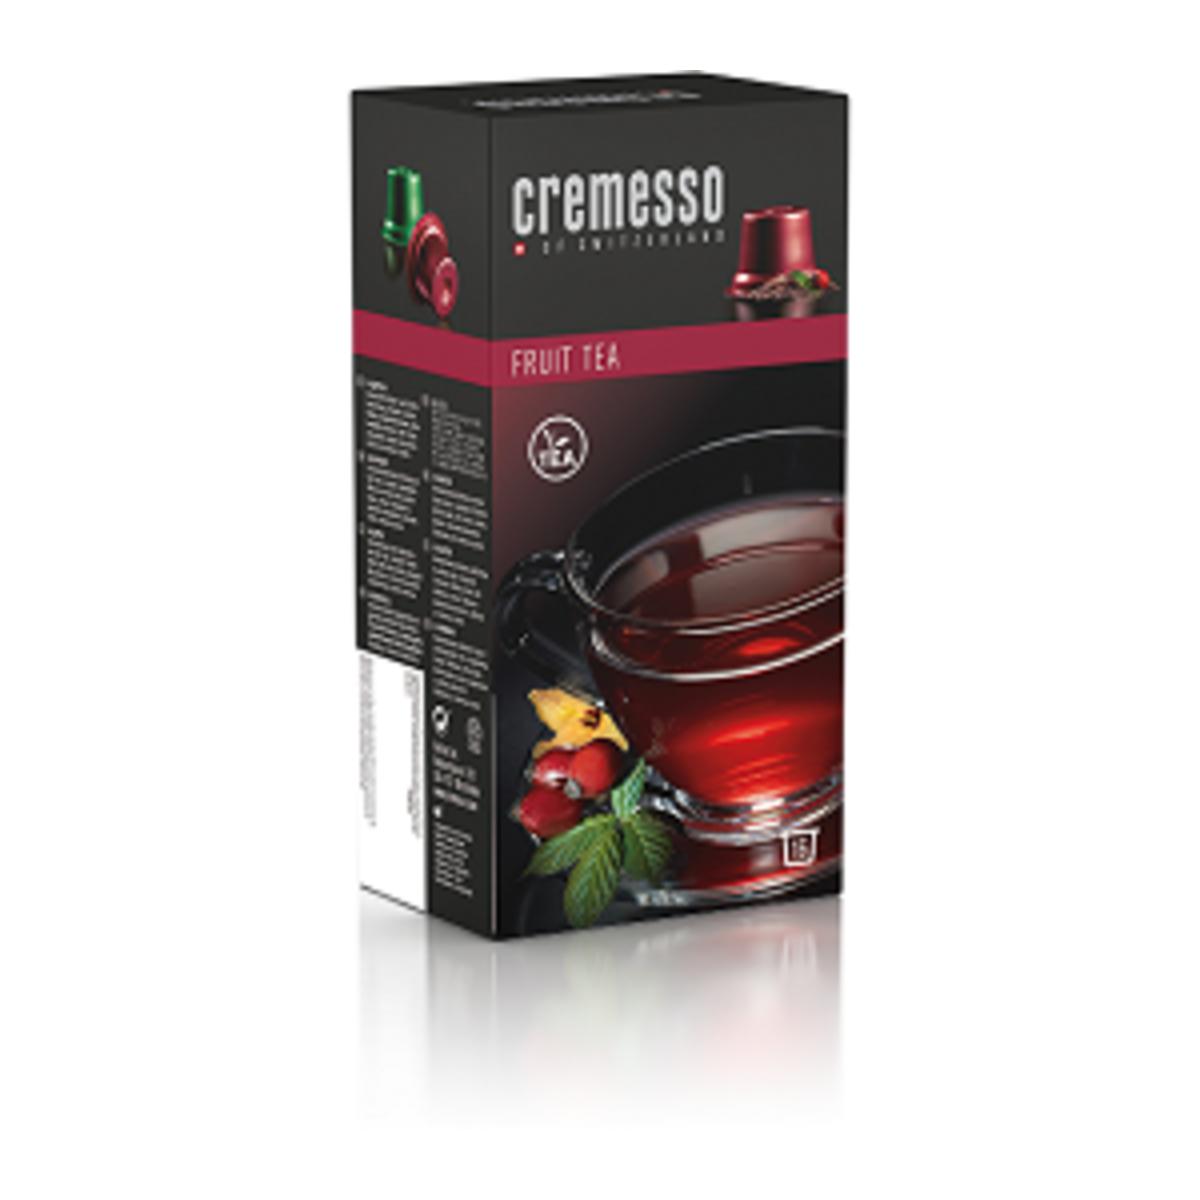 Cremesso Fruit Fantasy 16бр капсули чай